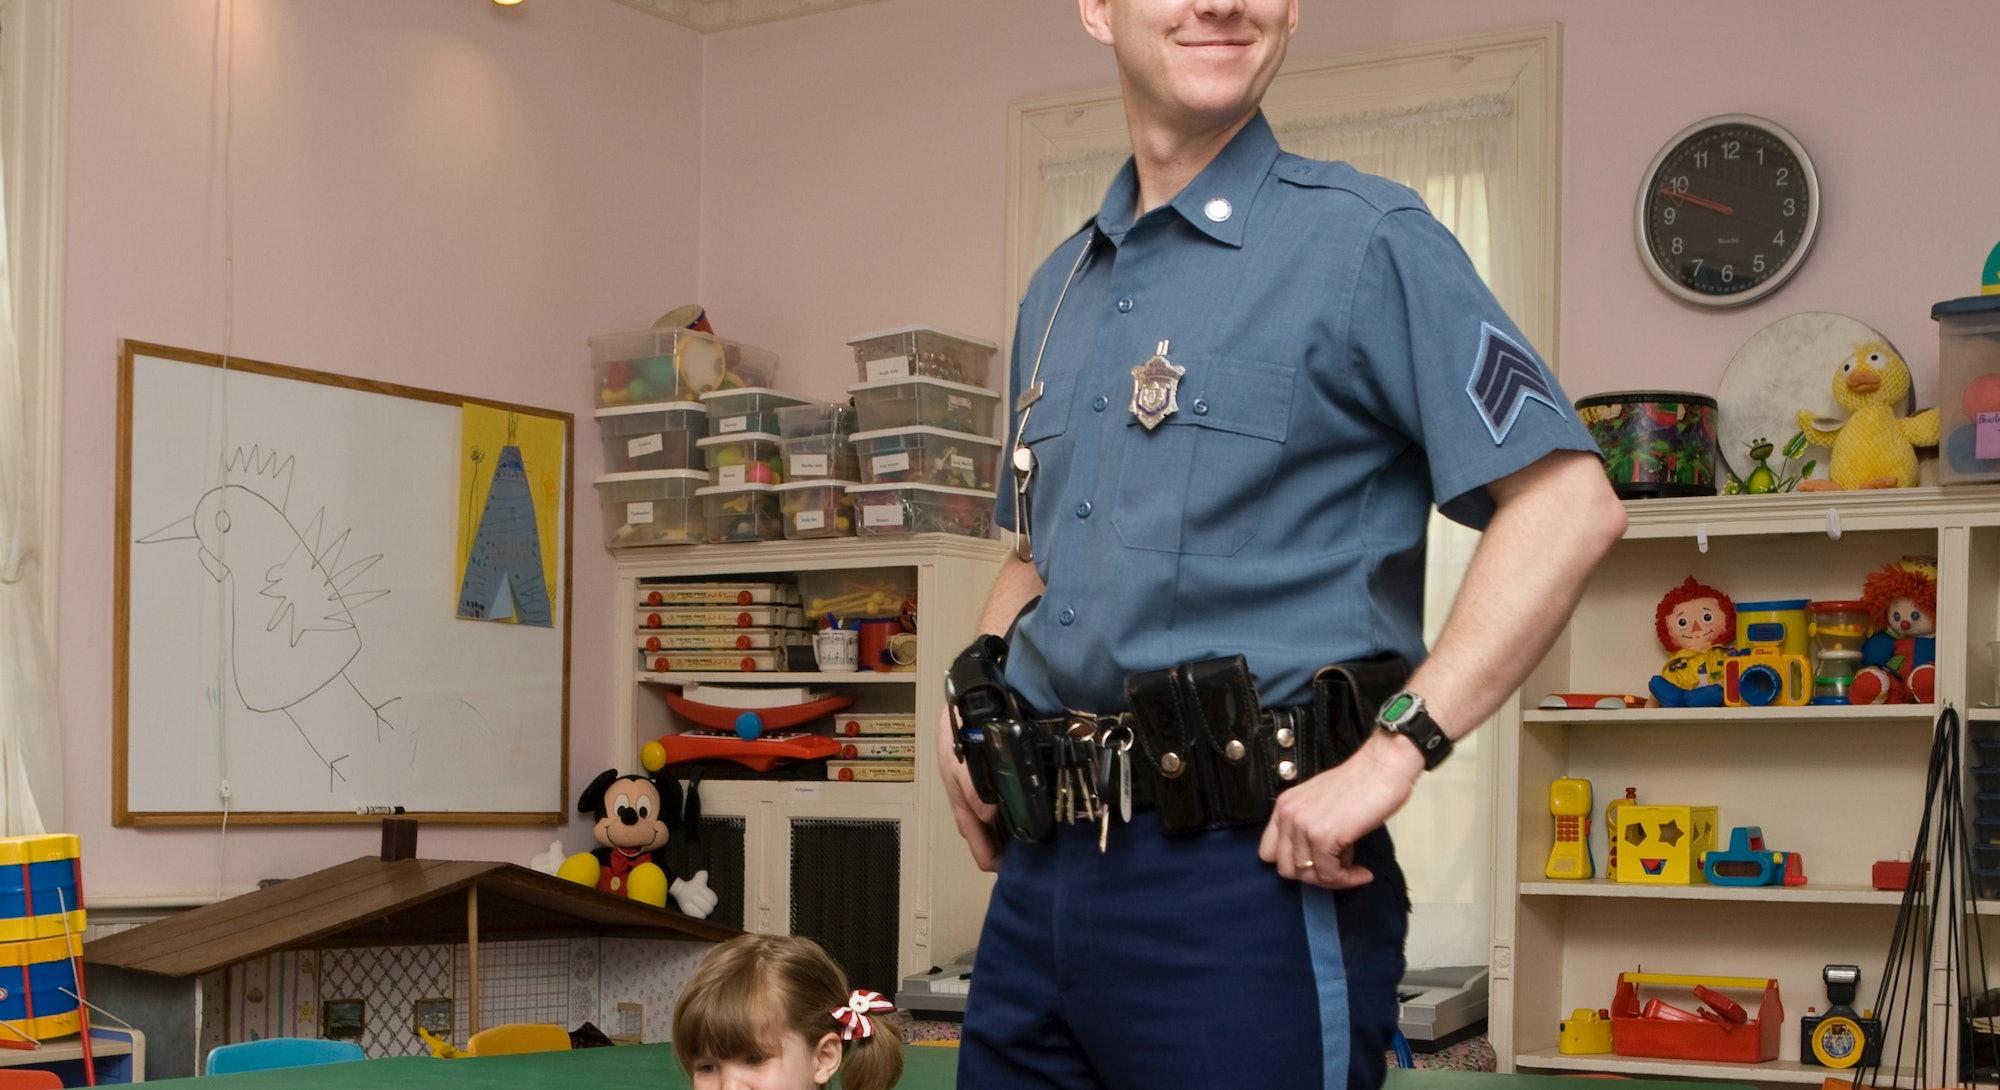 police officer in school classroom